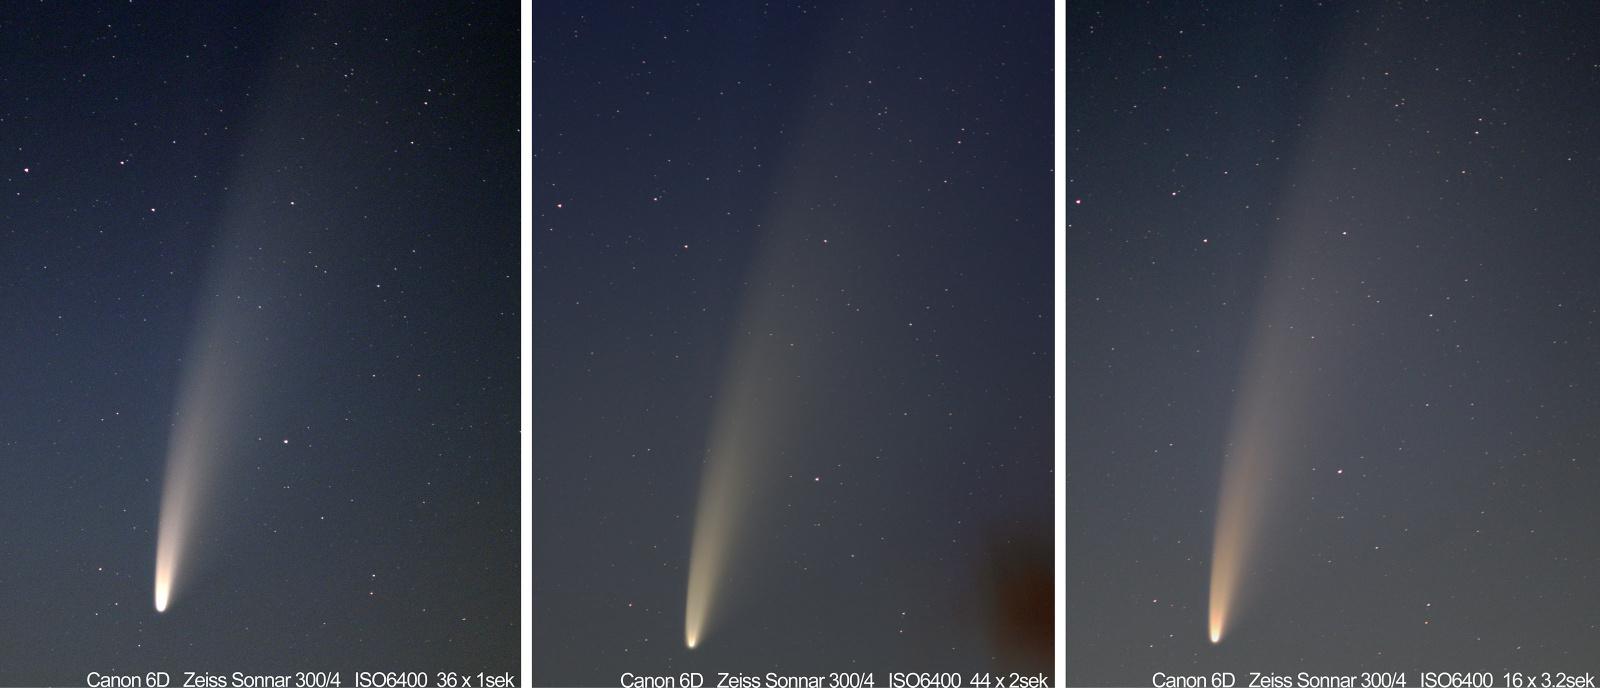 zestaw komet.jpg